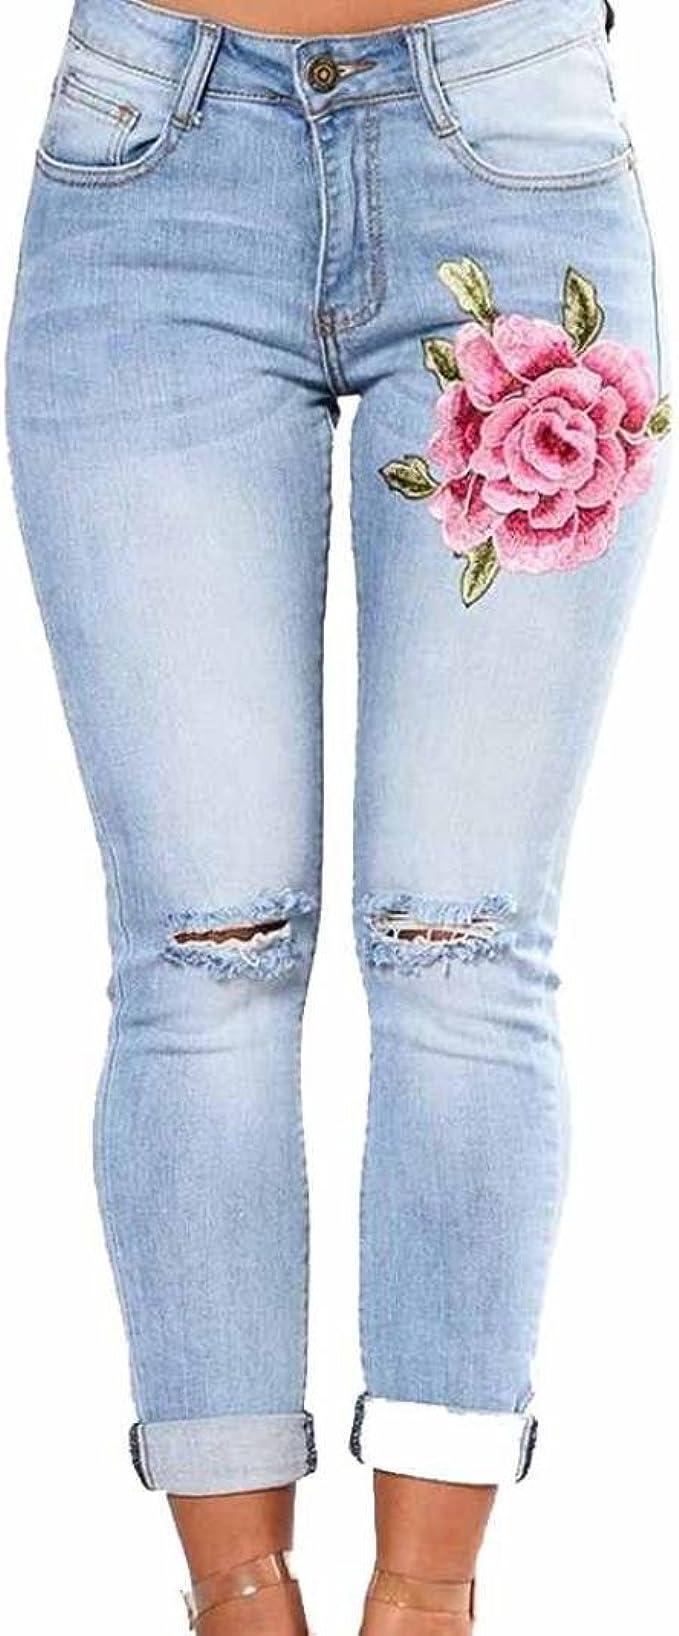 Vaqueros Slim fit Mujer Talle Alto Flaco Pantalones Largos lápiz ...